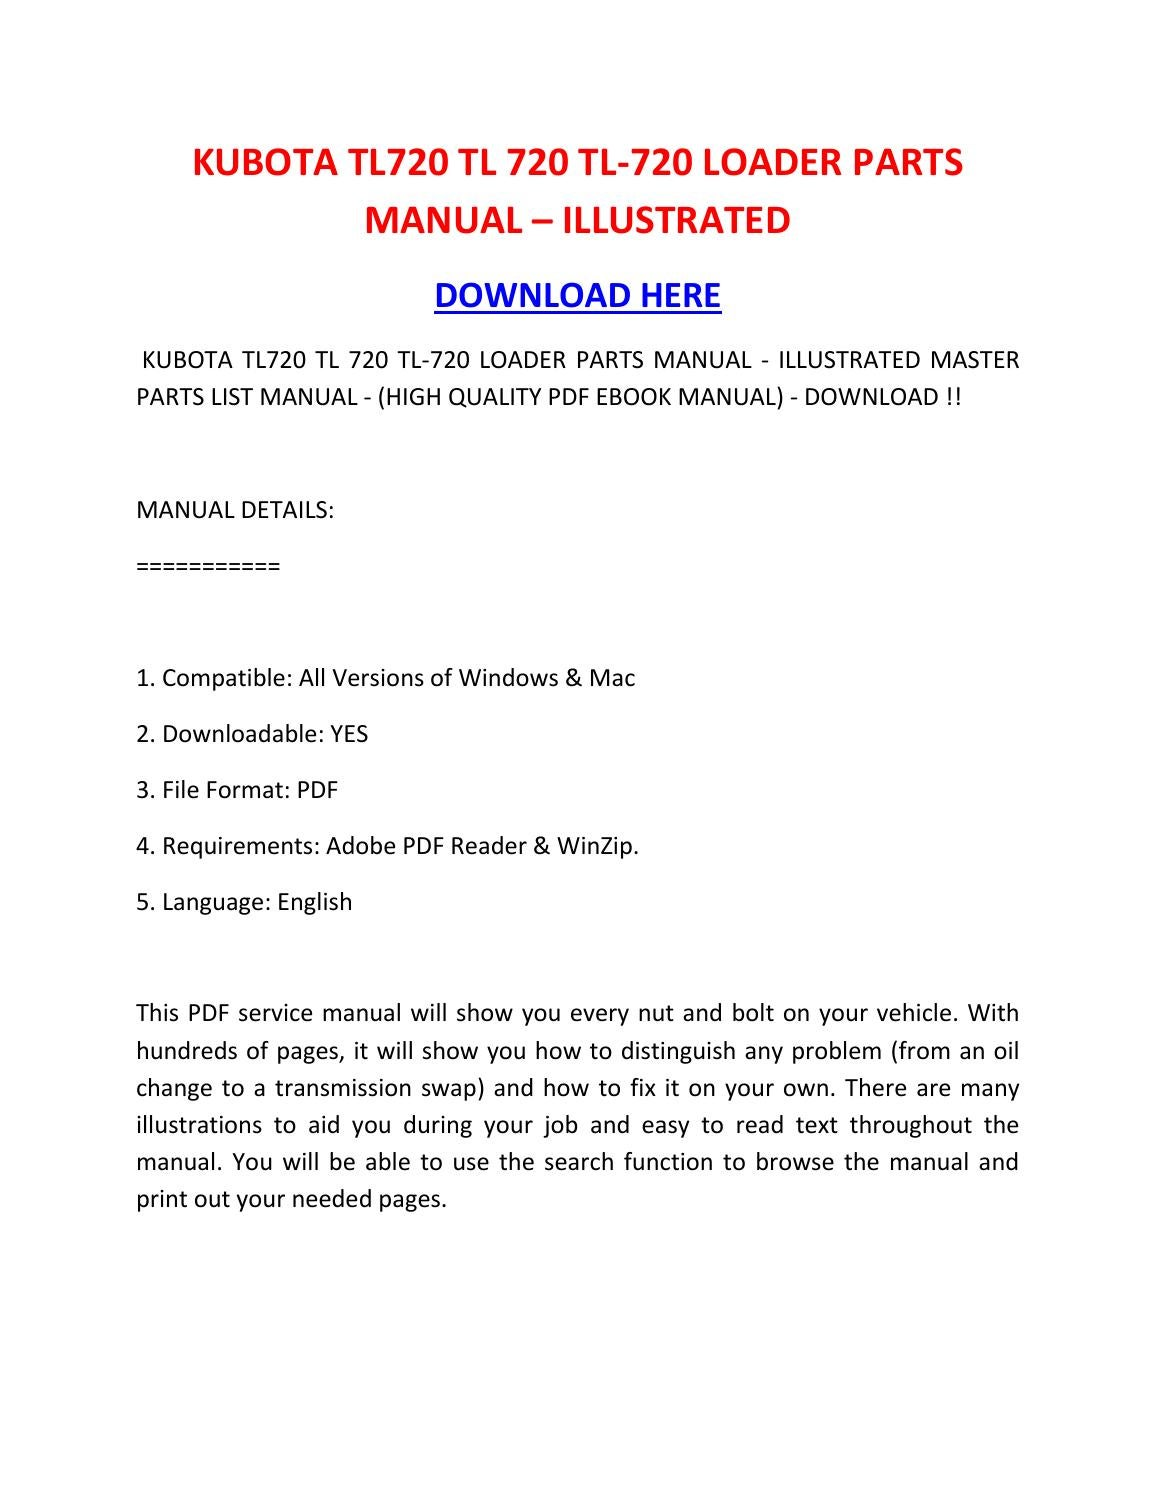 Kubota tl720 tl 720 tl 720 loader parts manual – illustrated by rocky -  issuu